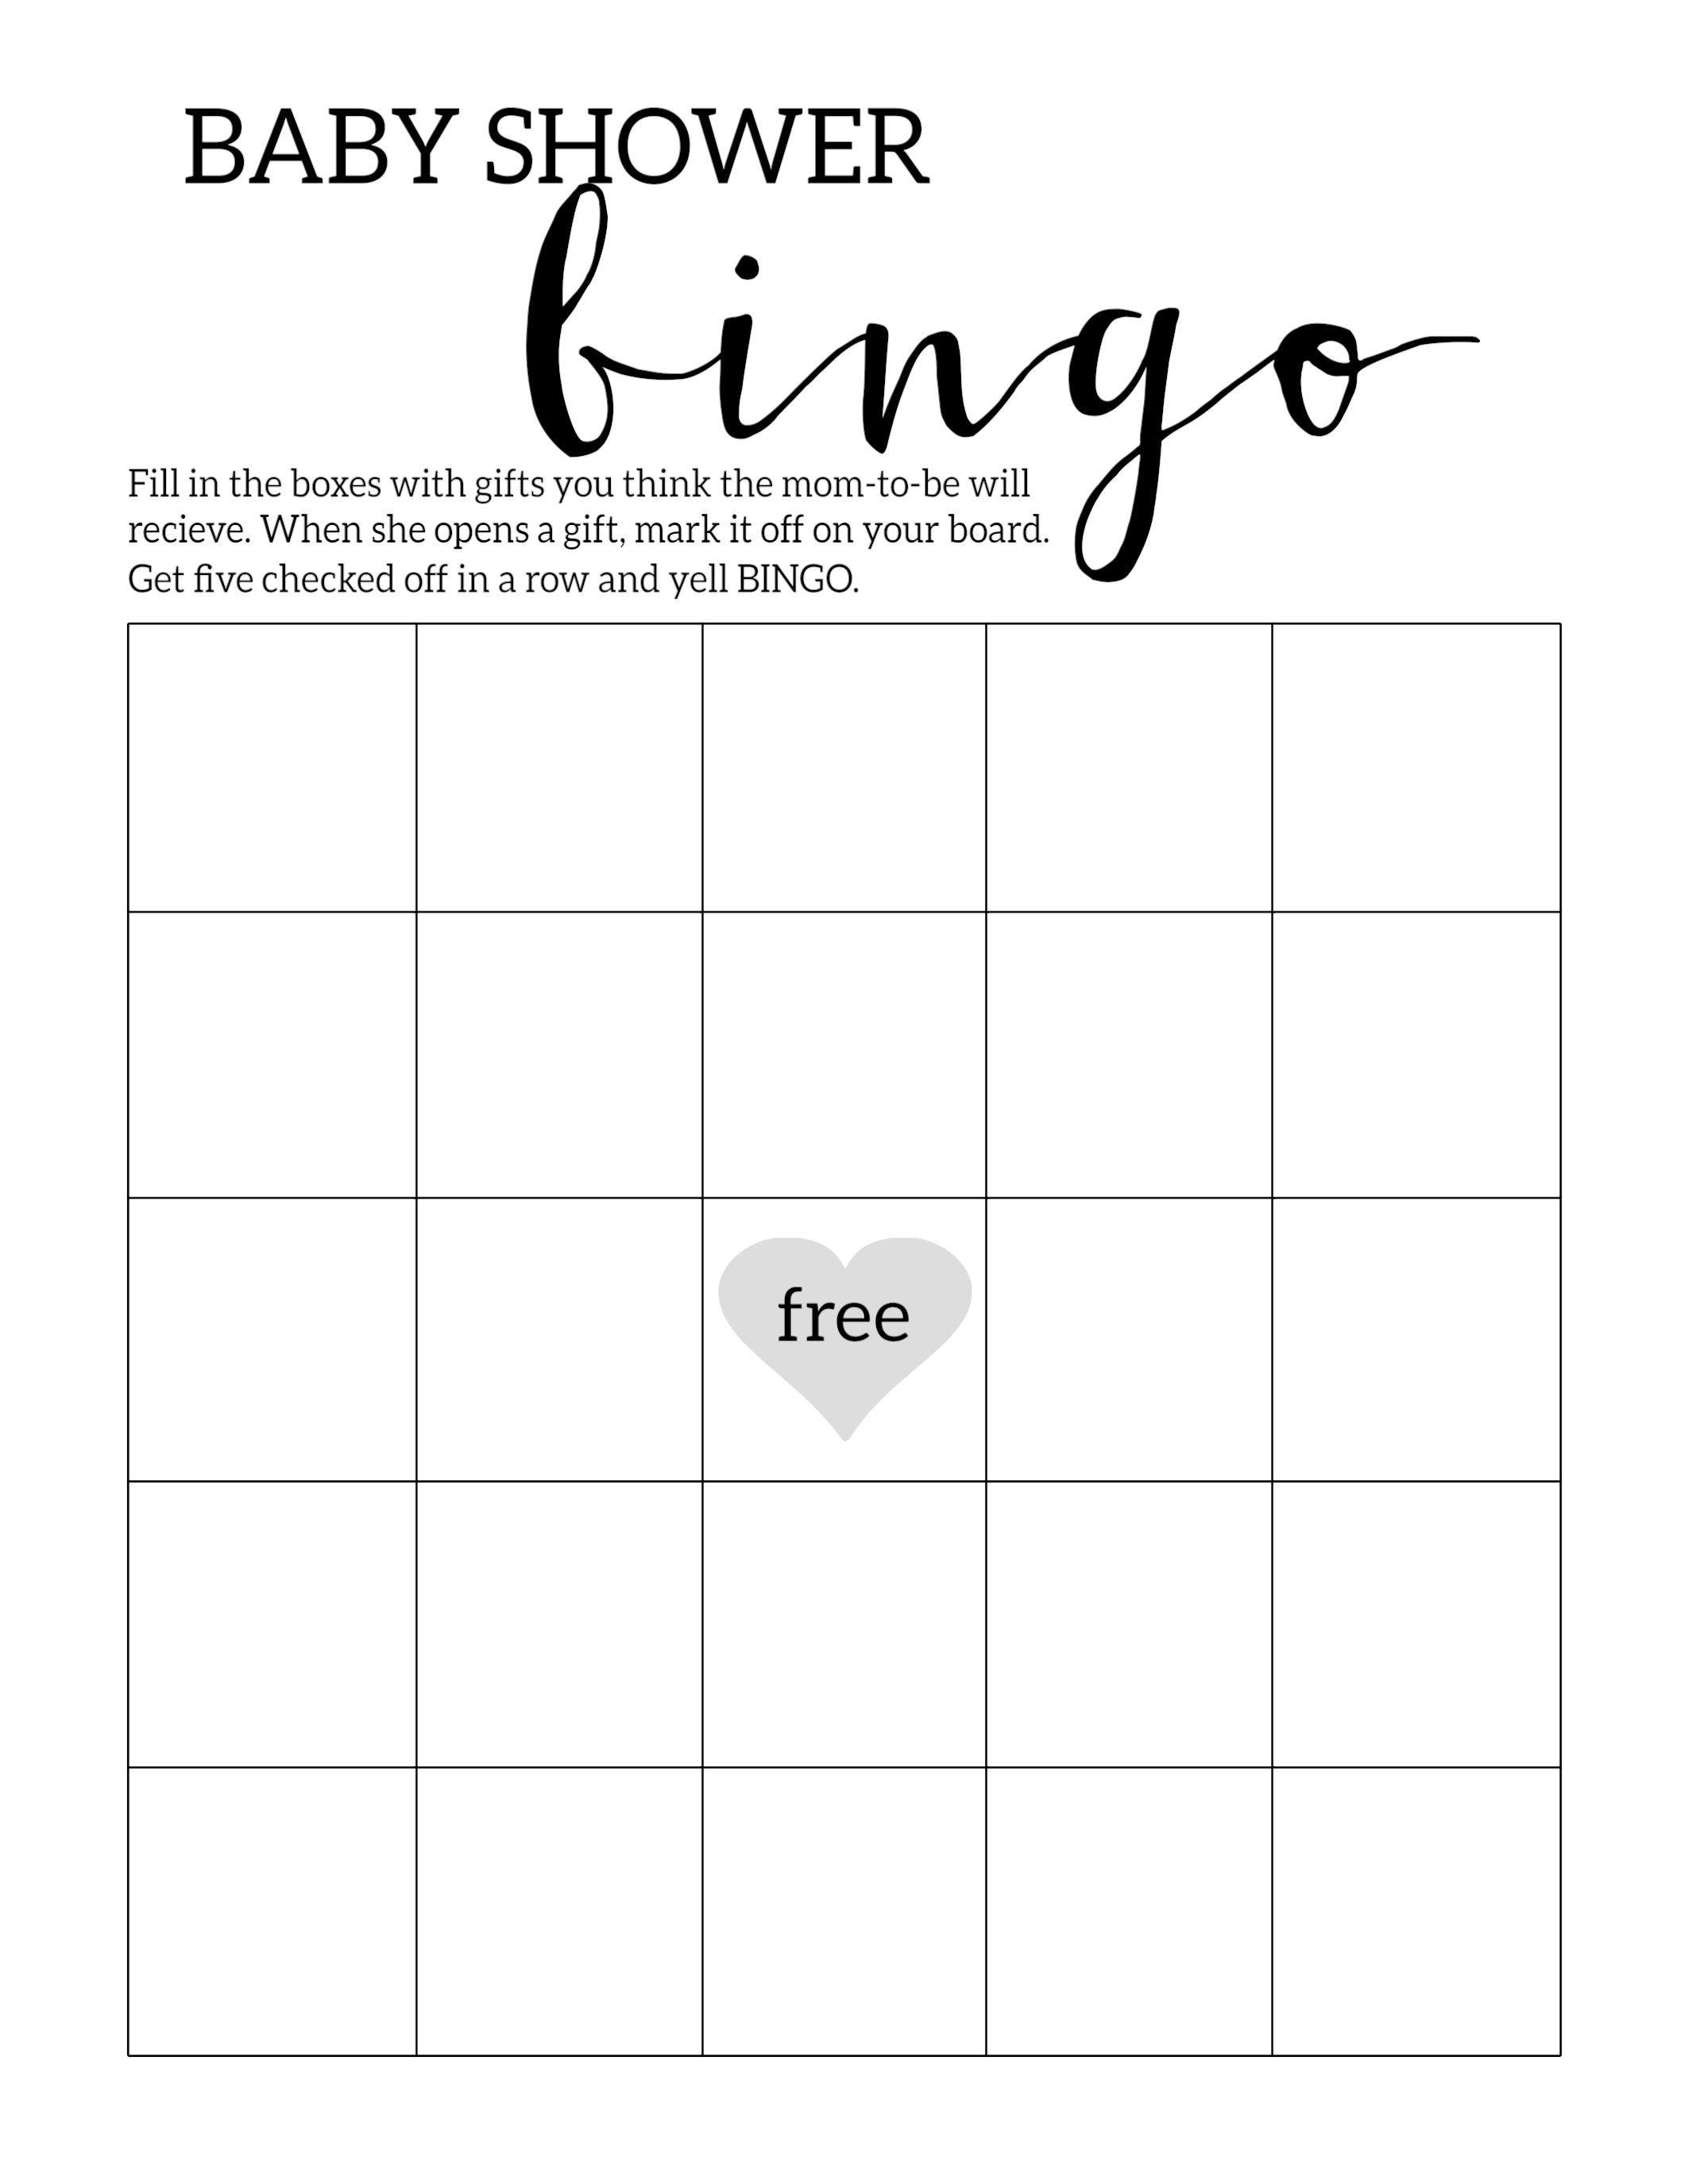 Baby Shower Bingo Printable Cards Template   Baby Shower   Baby - Baby Bingo Game Free Printable